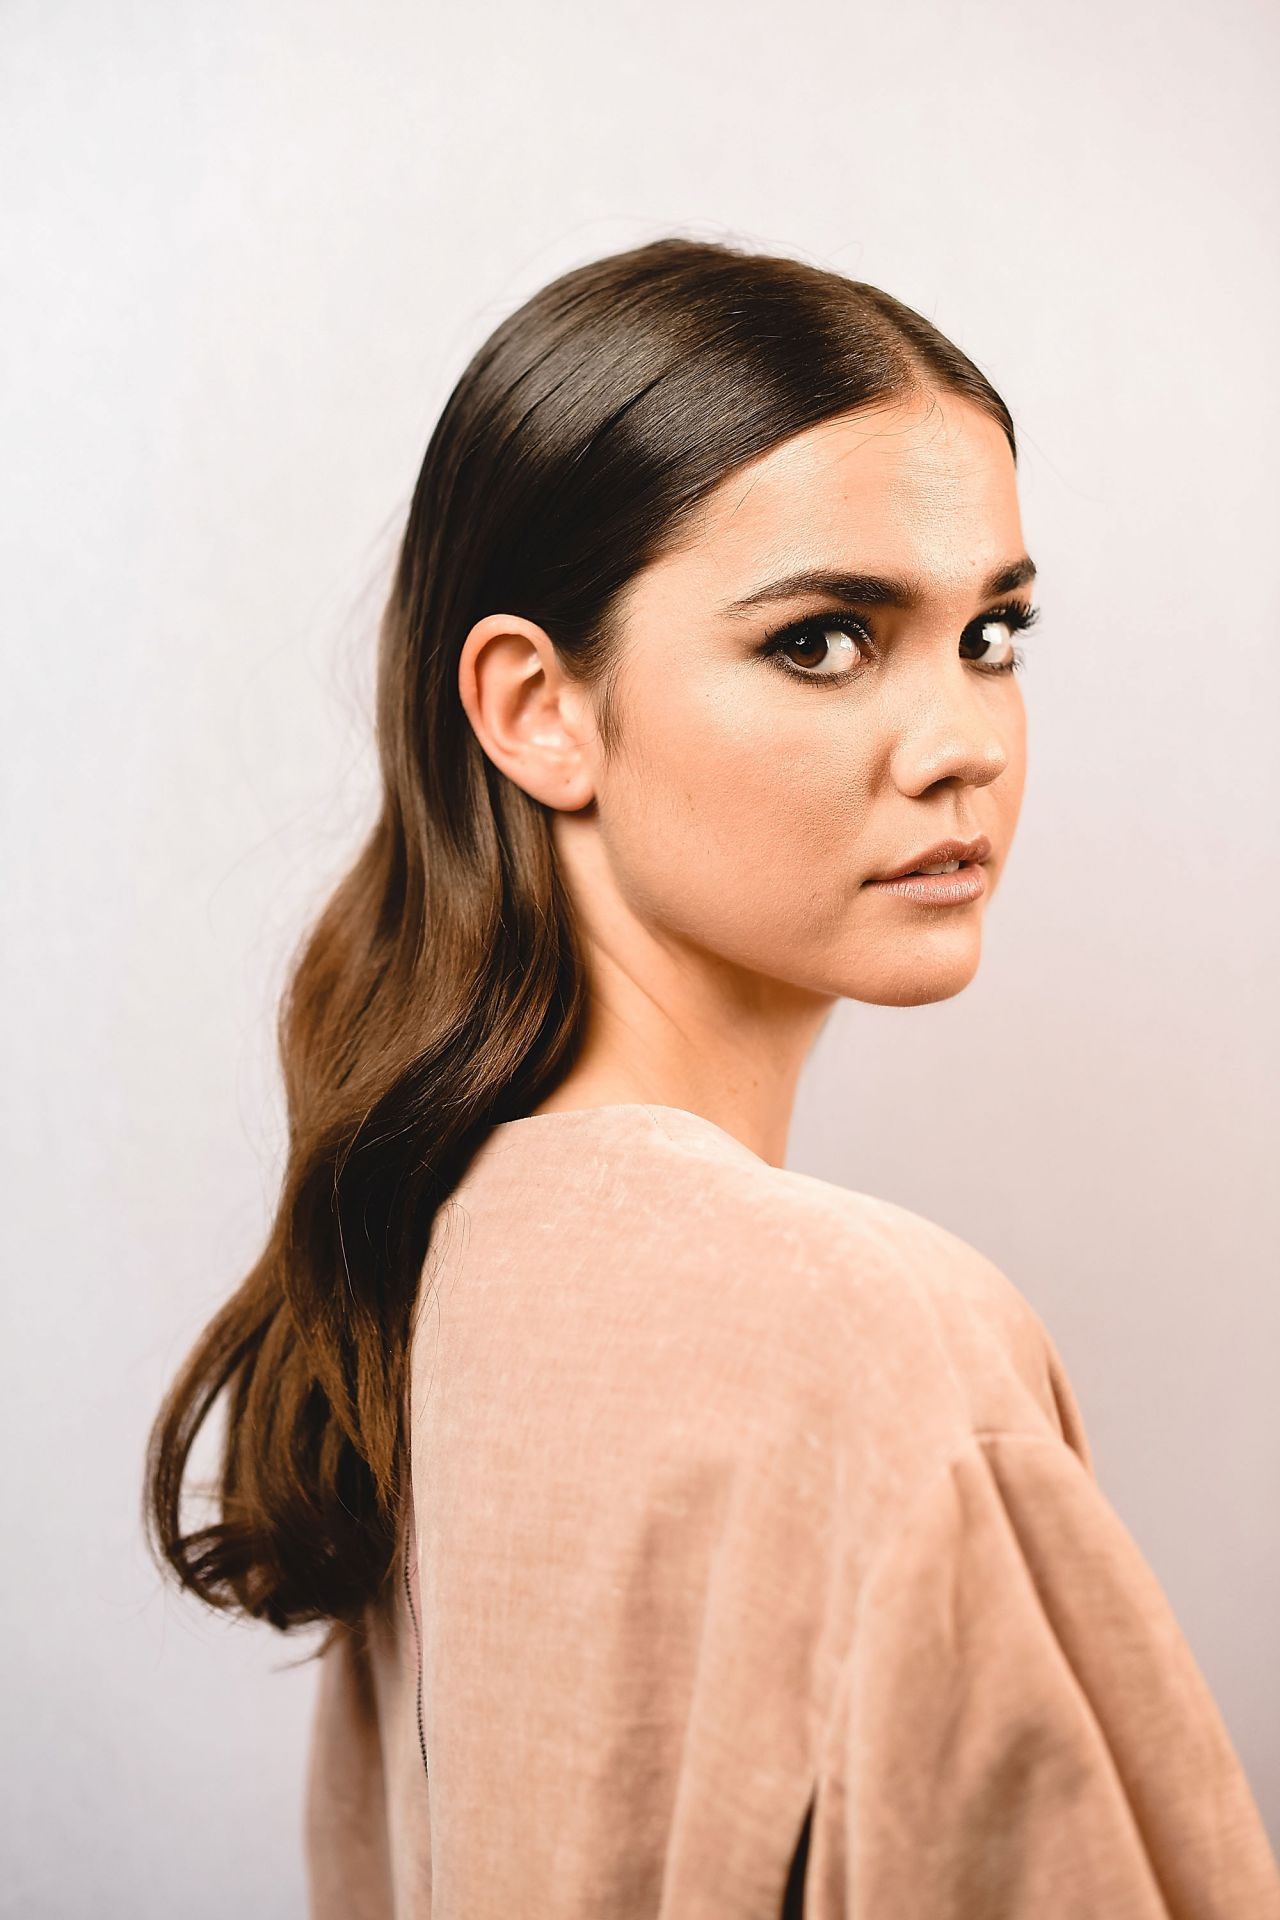 Maia Mitchell Hot